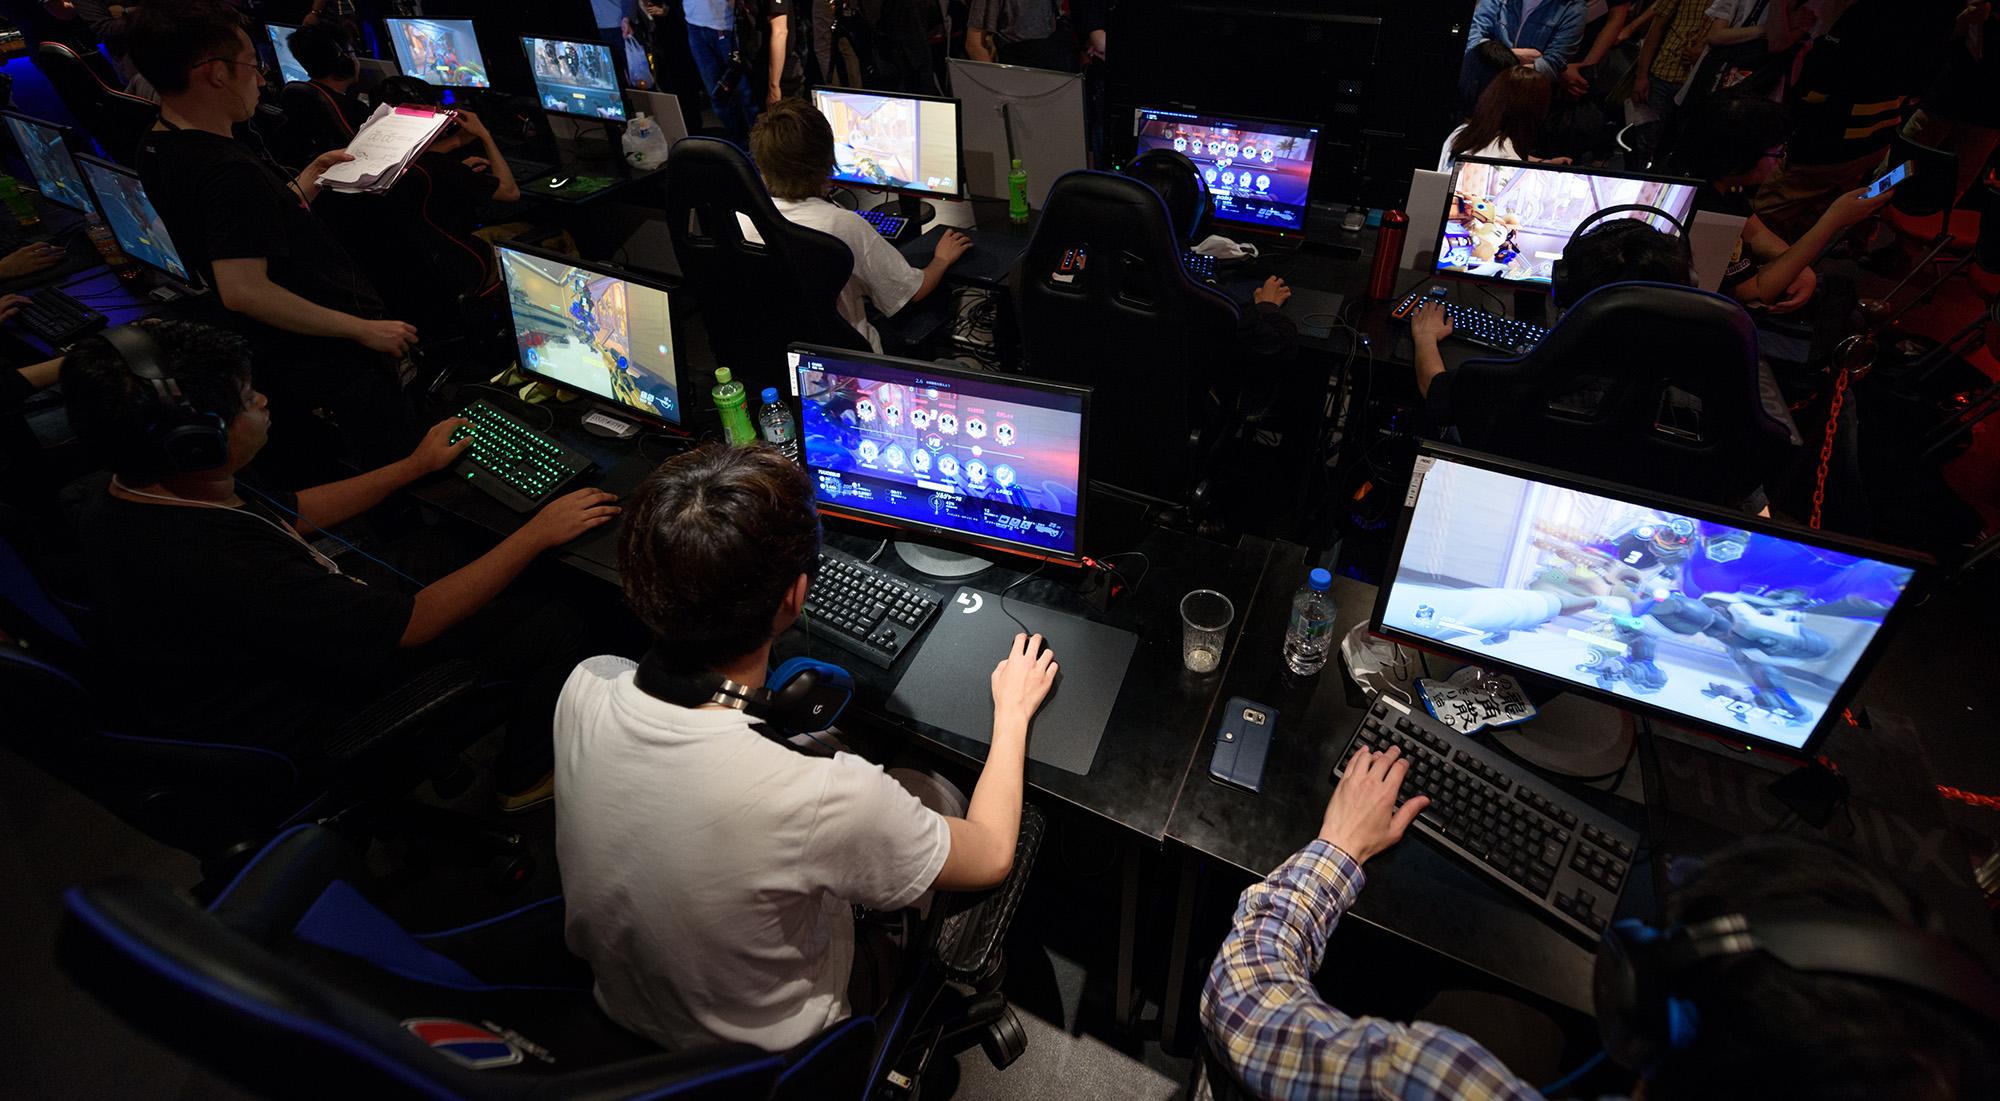 Disney (DIS) Investor Says Buy Activision (ATVI) on Stock